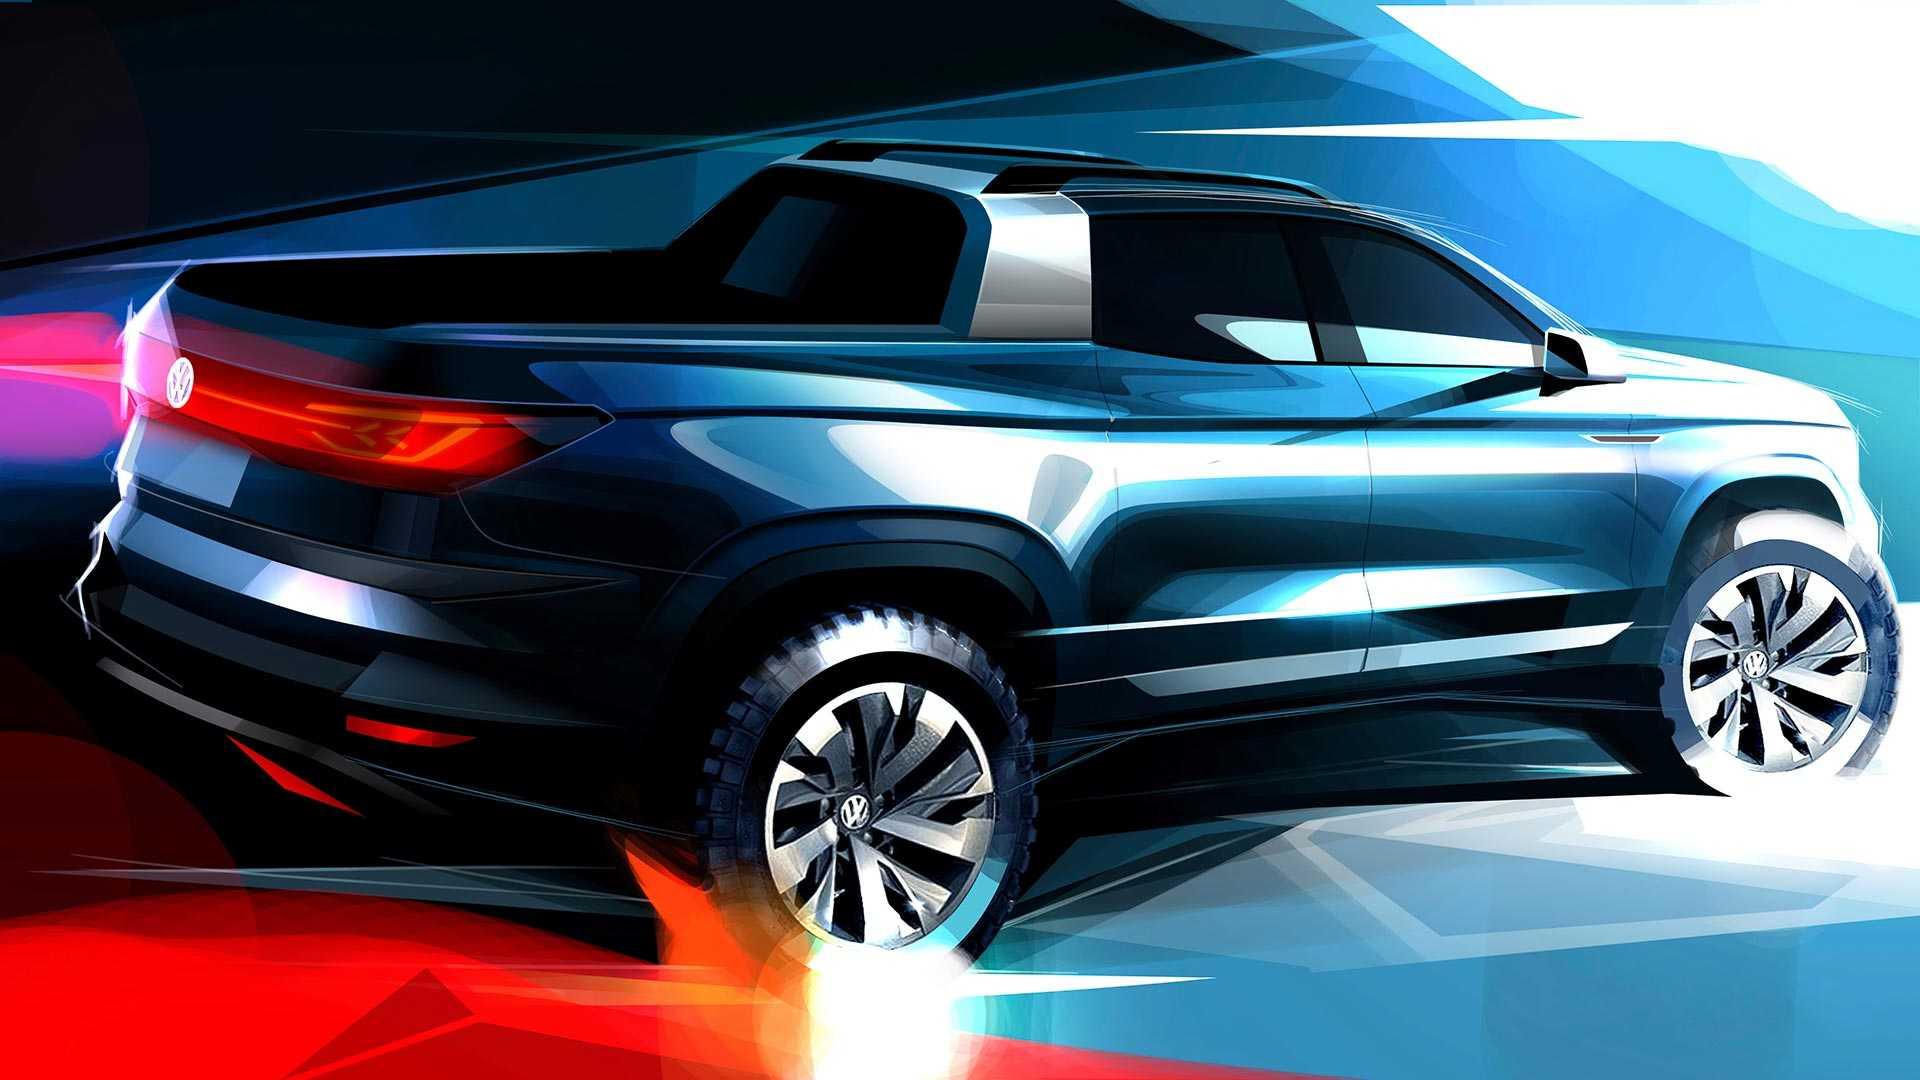 Volkswagen раскрыл дизайн маленького пикапа